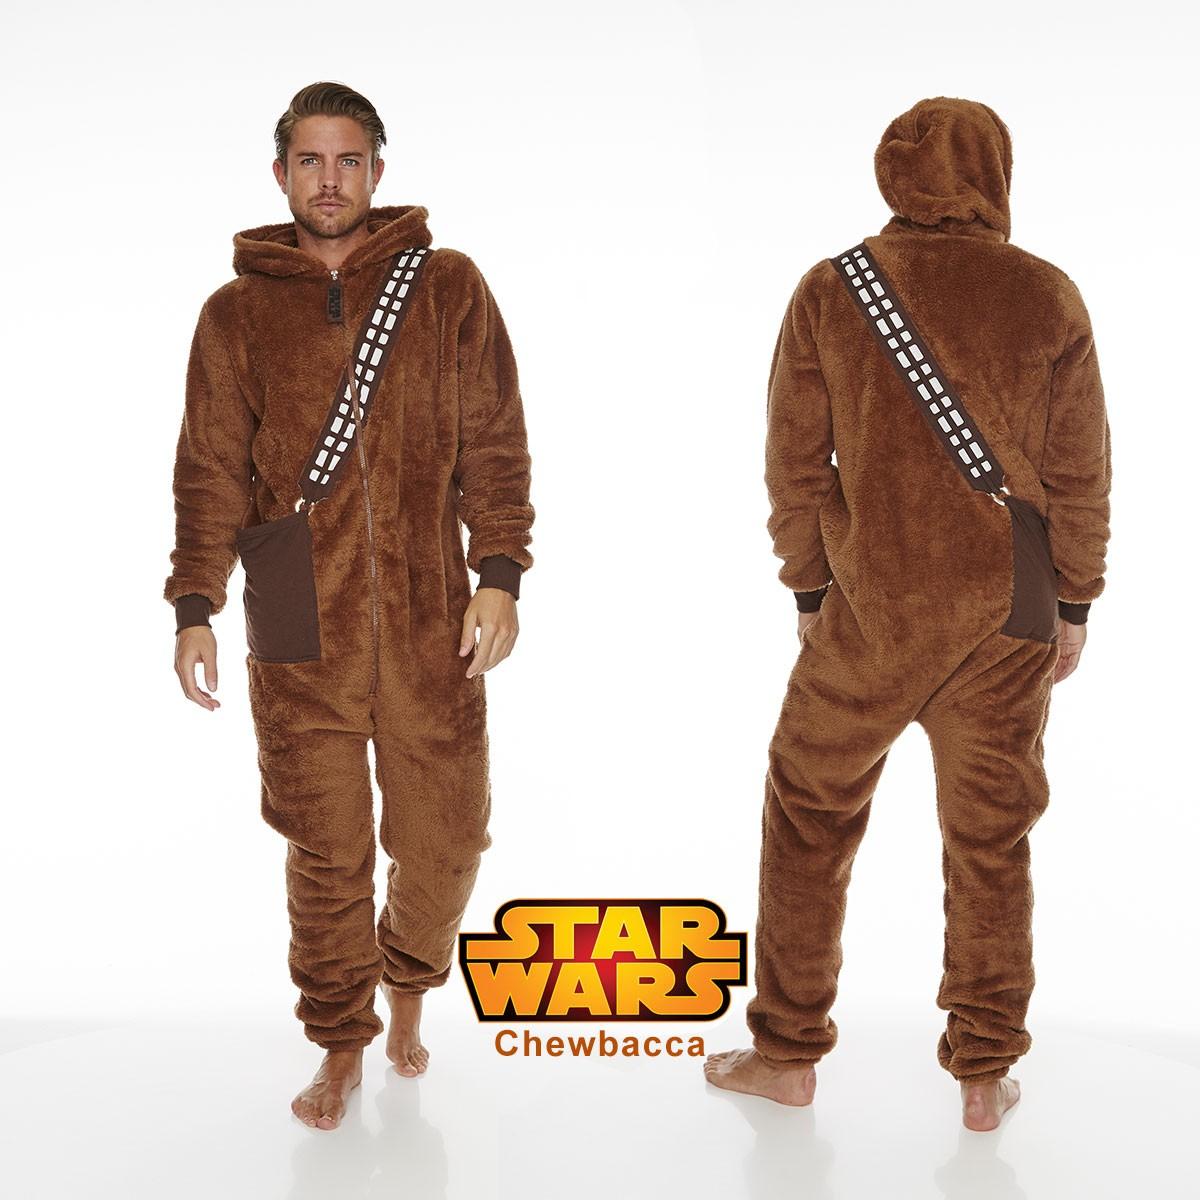 pyjama star wars l 39 effigie de chewbacca sur rapid cadeau. Black Bedroom Furniture Sets. Home Design Ideas